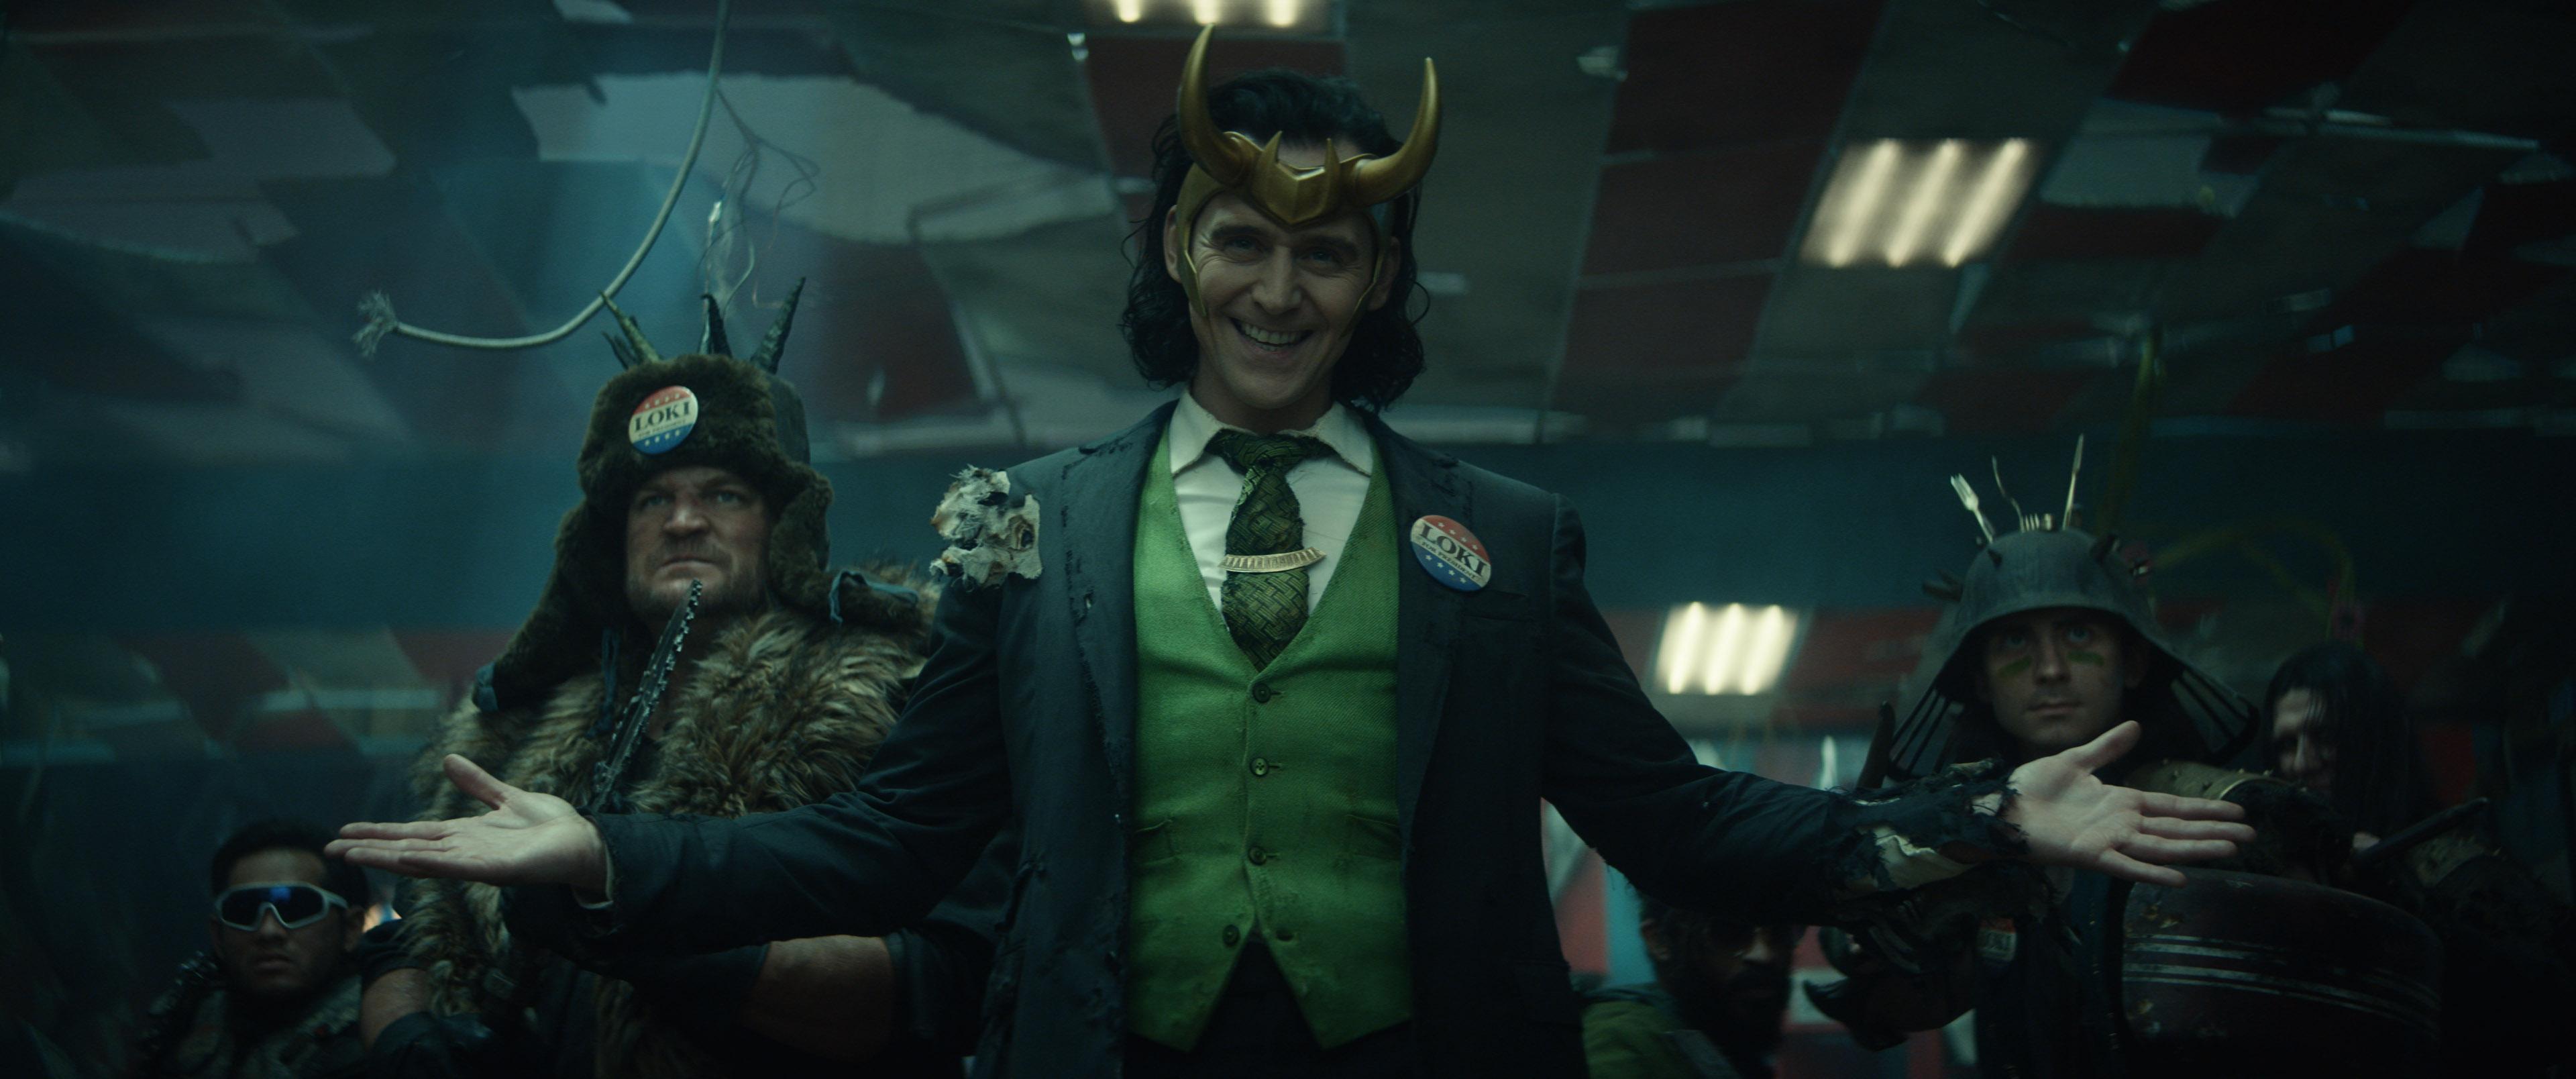 President Loki and his backup Lokis loki it up on Loki